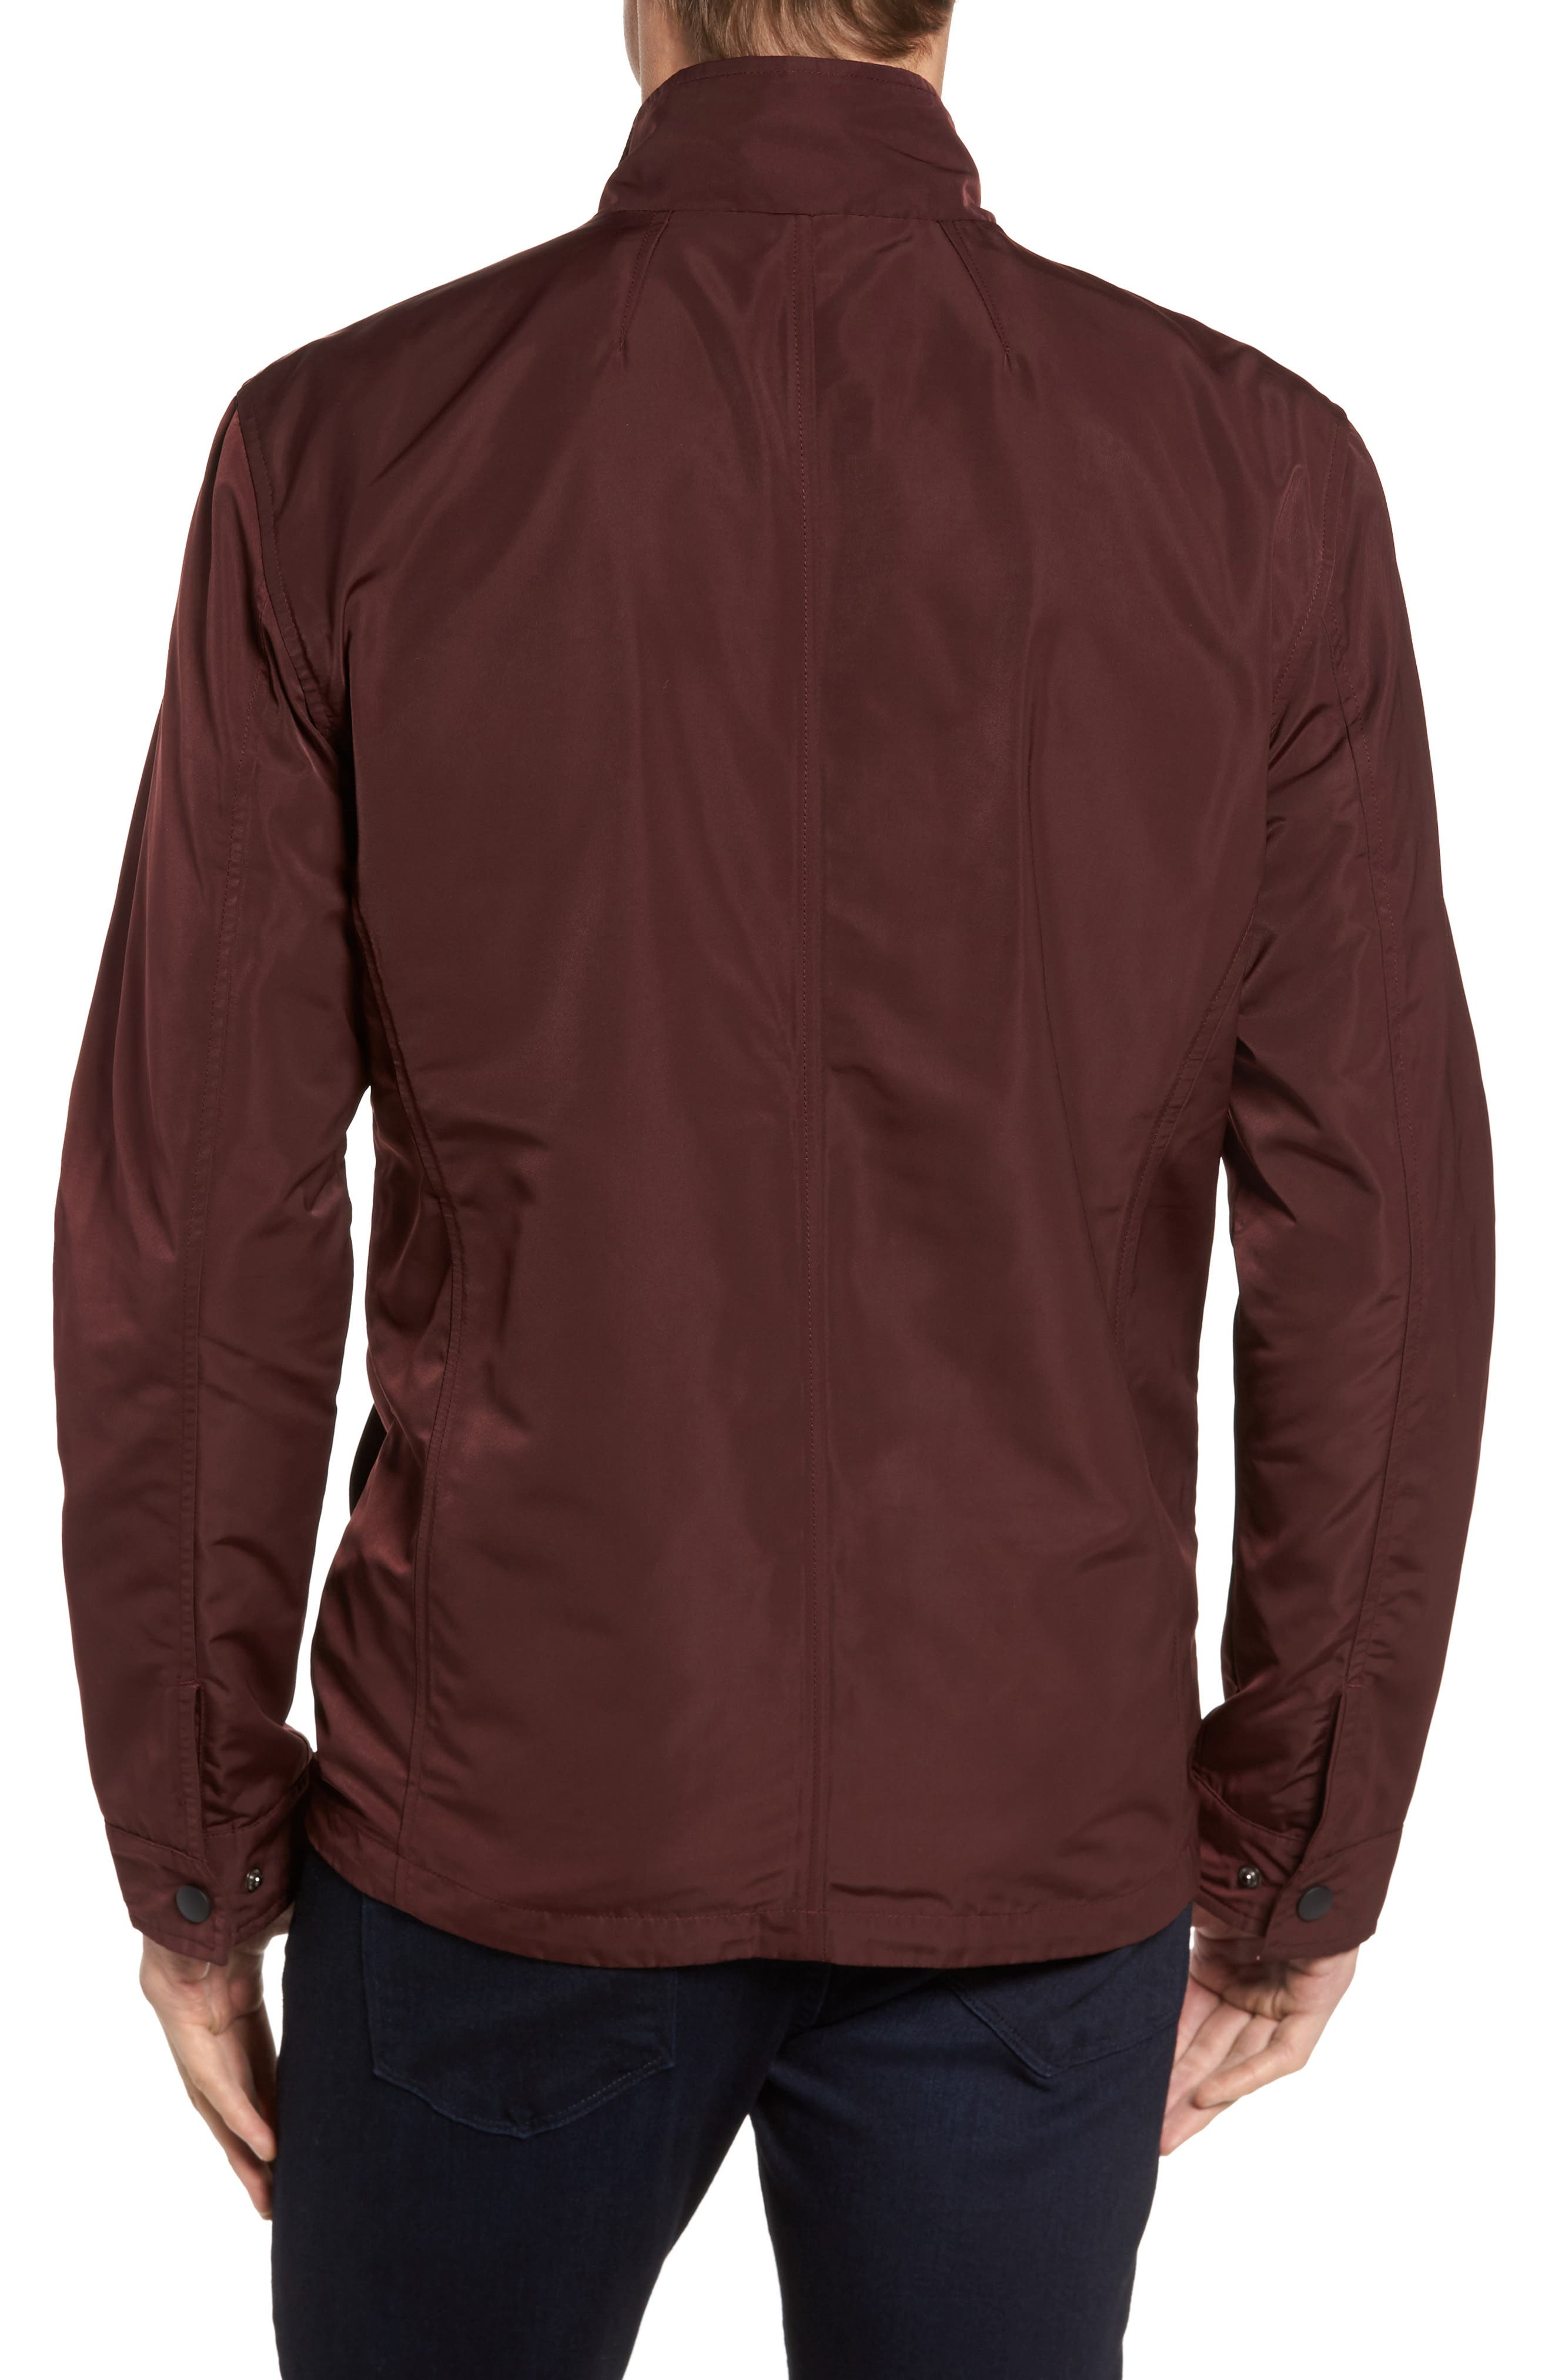 Dougie Waterproof Jacket,                             Alternate thumbnail 2, color,                             Mulberry